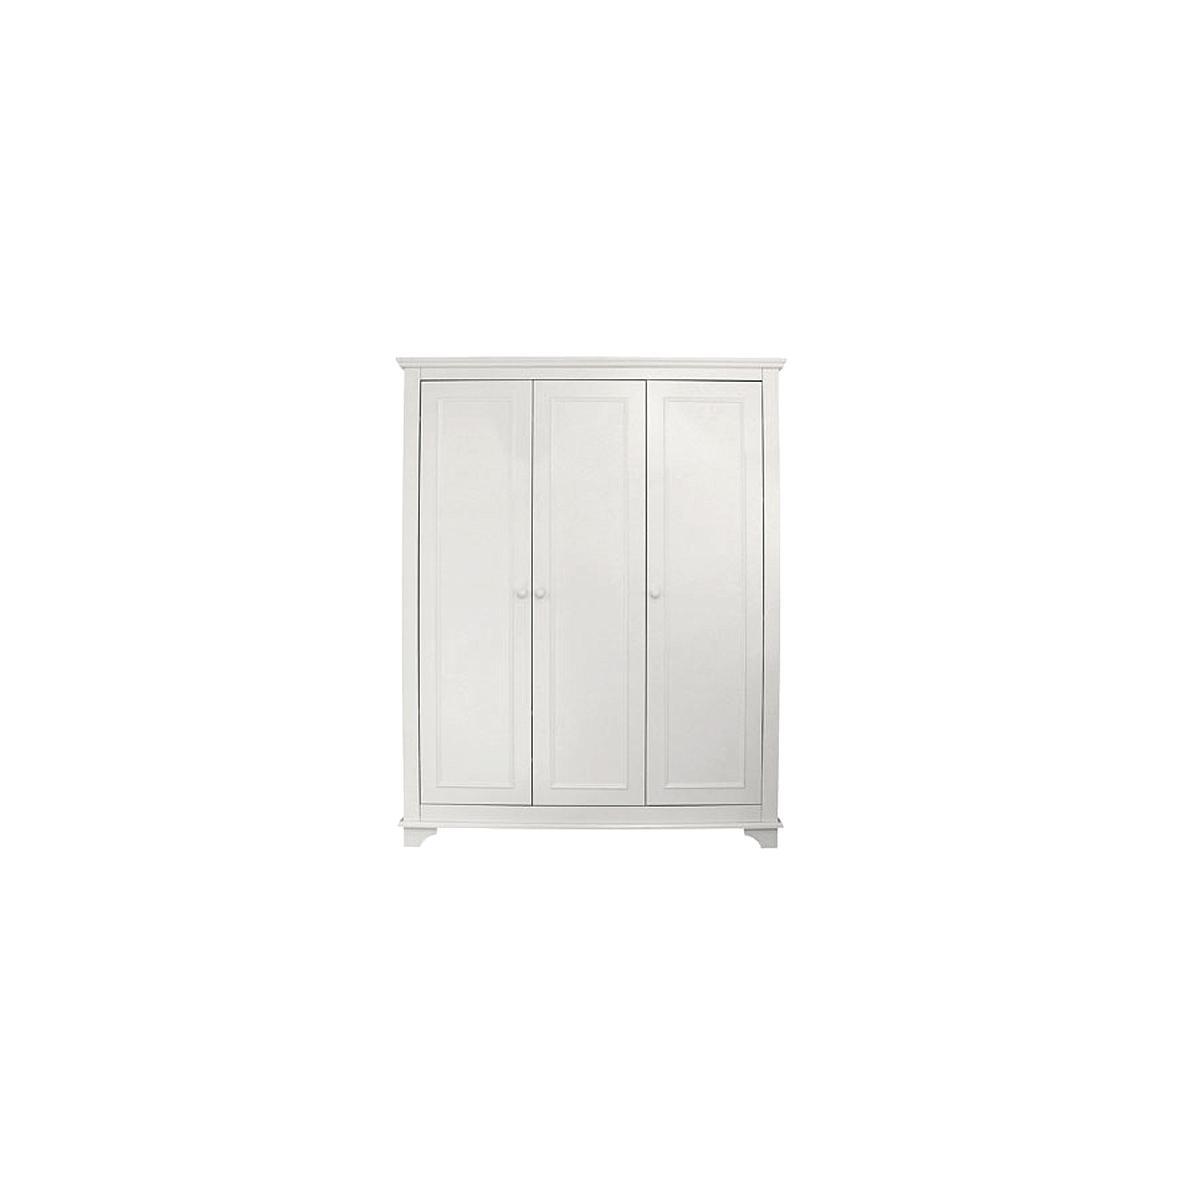 Armario 3 puertas CHARLOTTE Bopita blanco